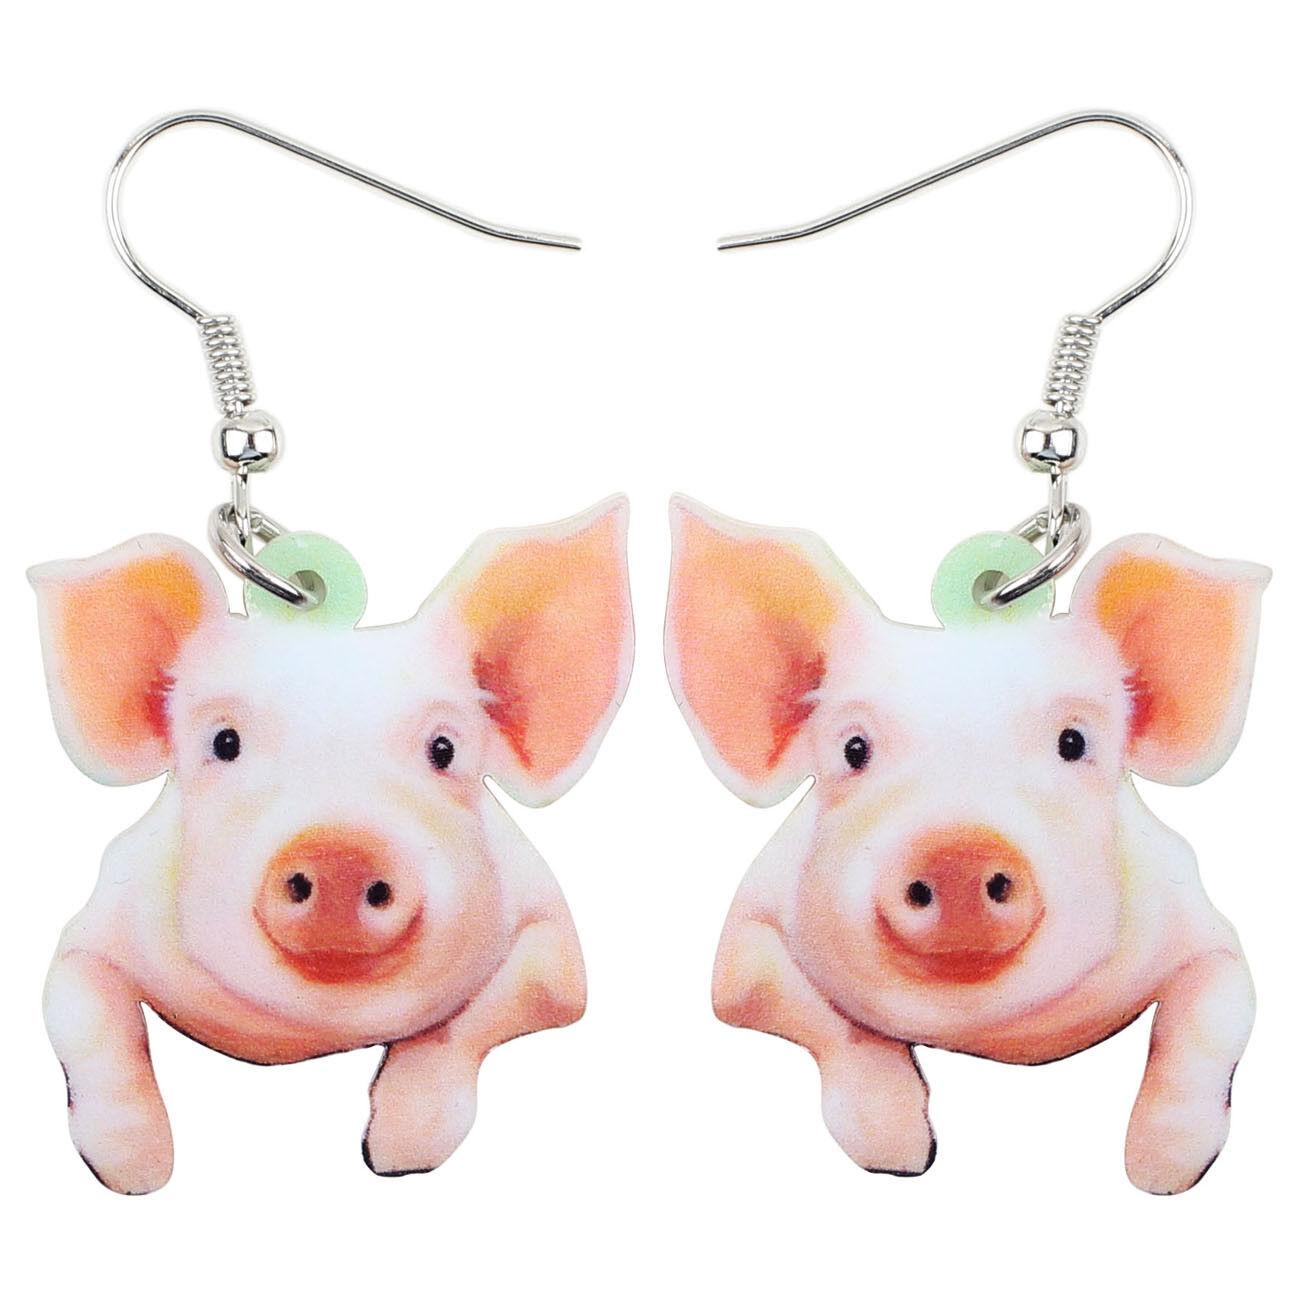 Acrylic Cute Funny Pig Piggy Earrings Dangle Charm Jewelry F